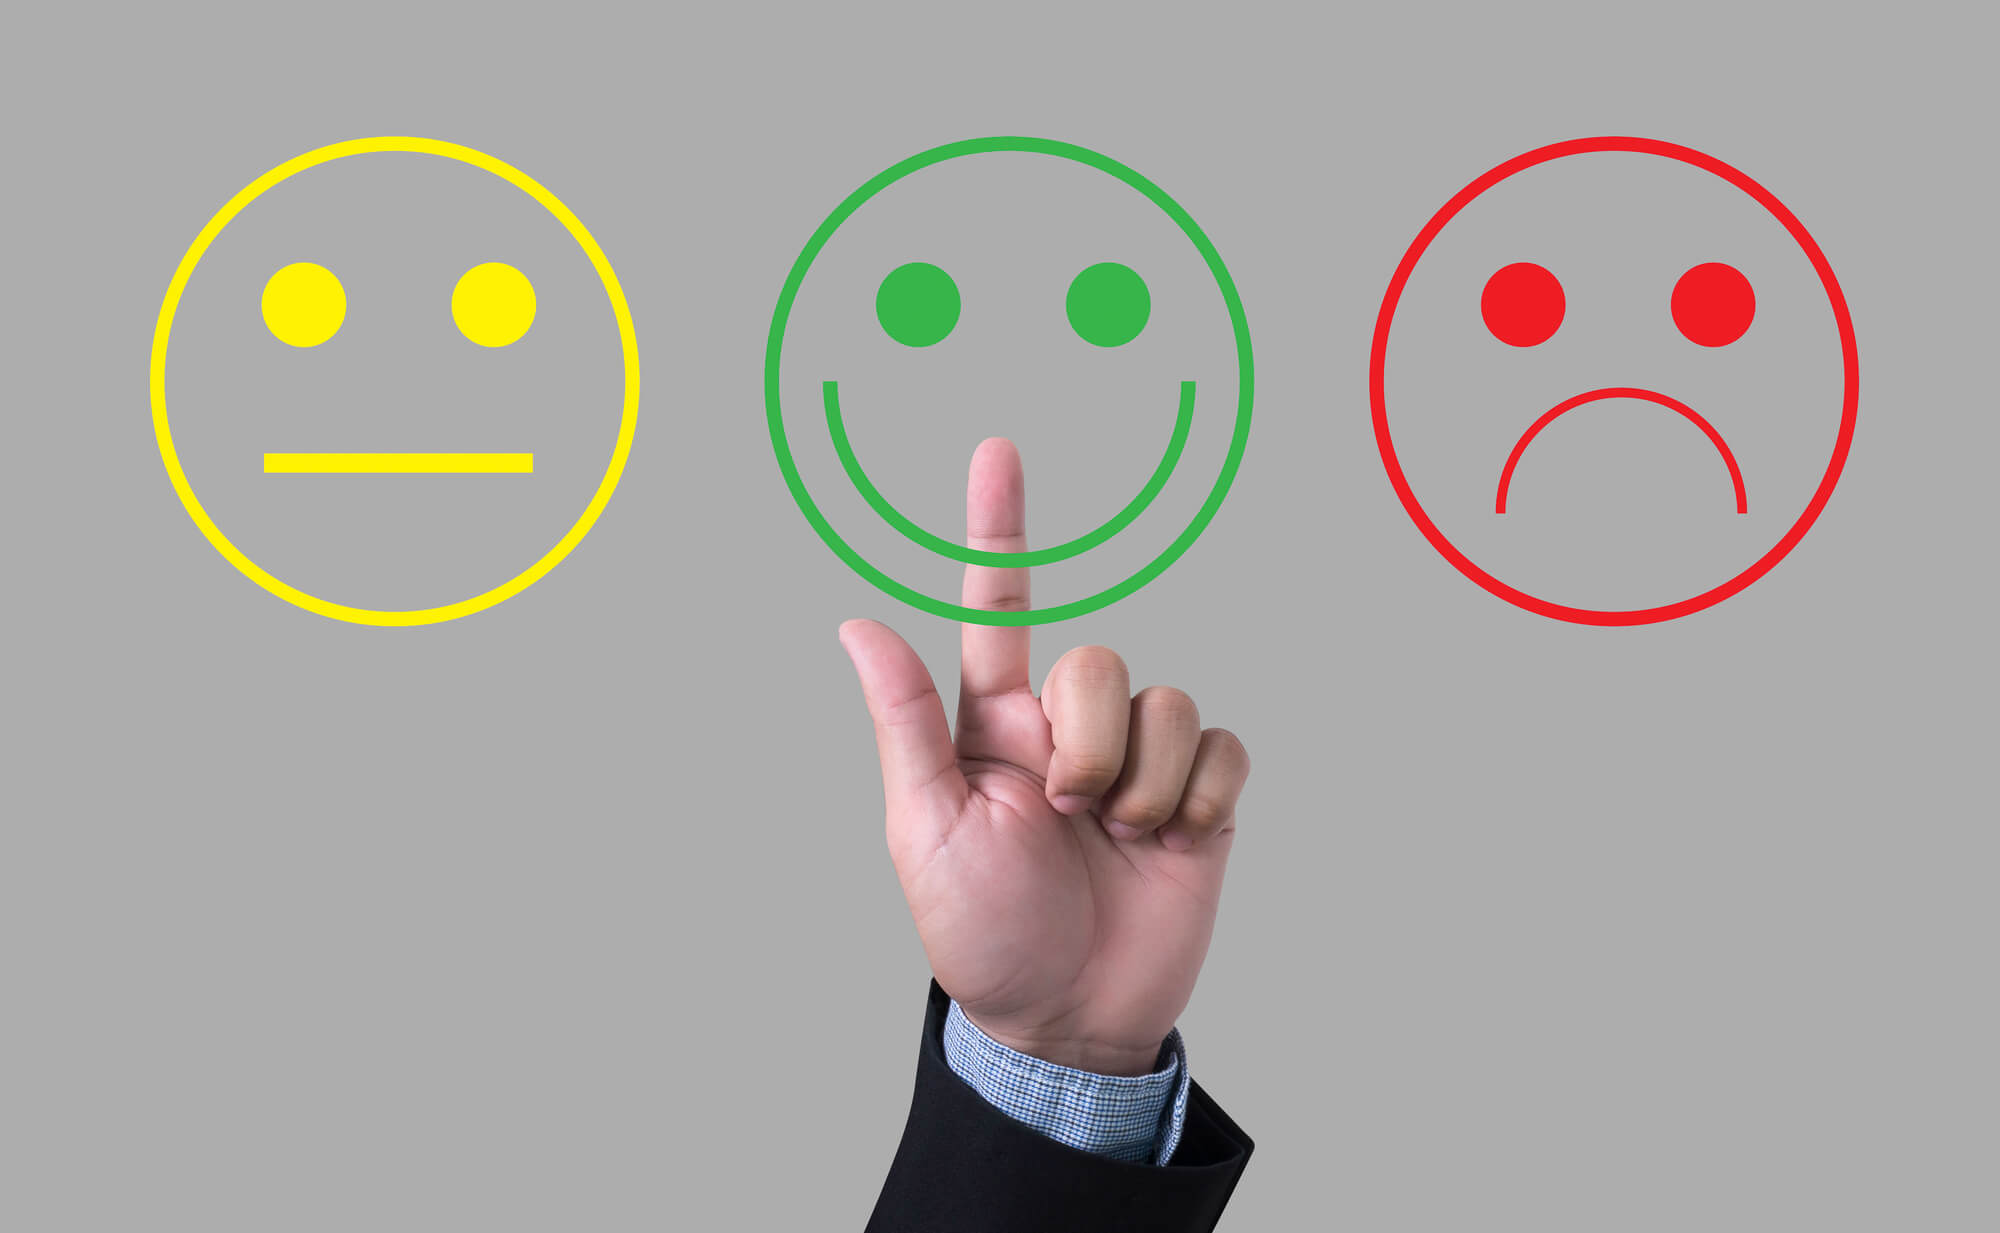 businessman-giving-good-feedback